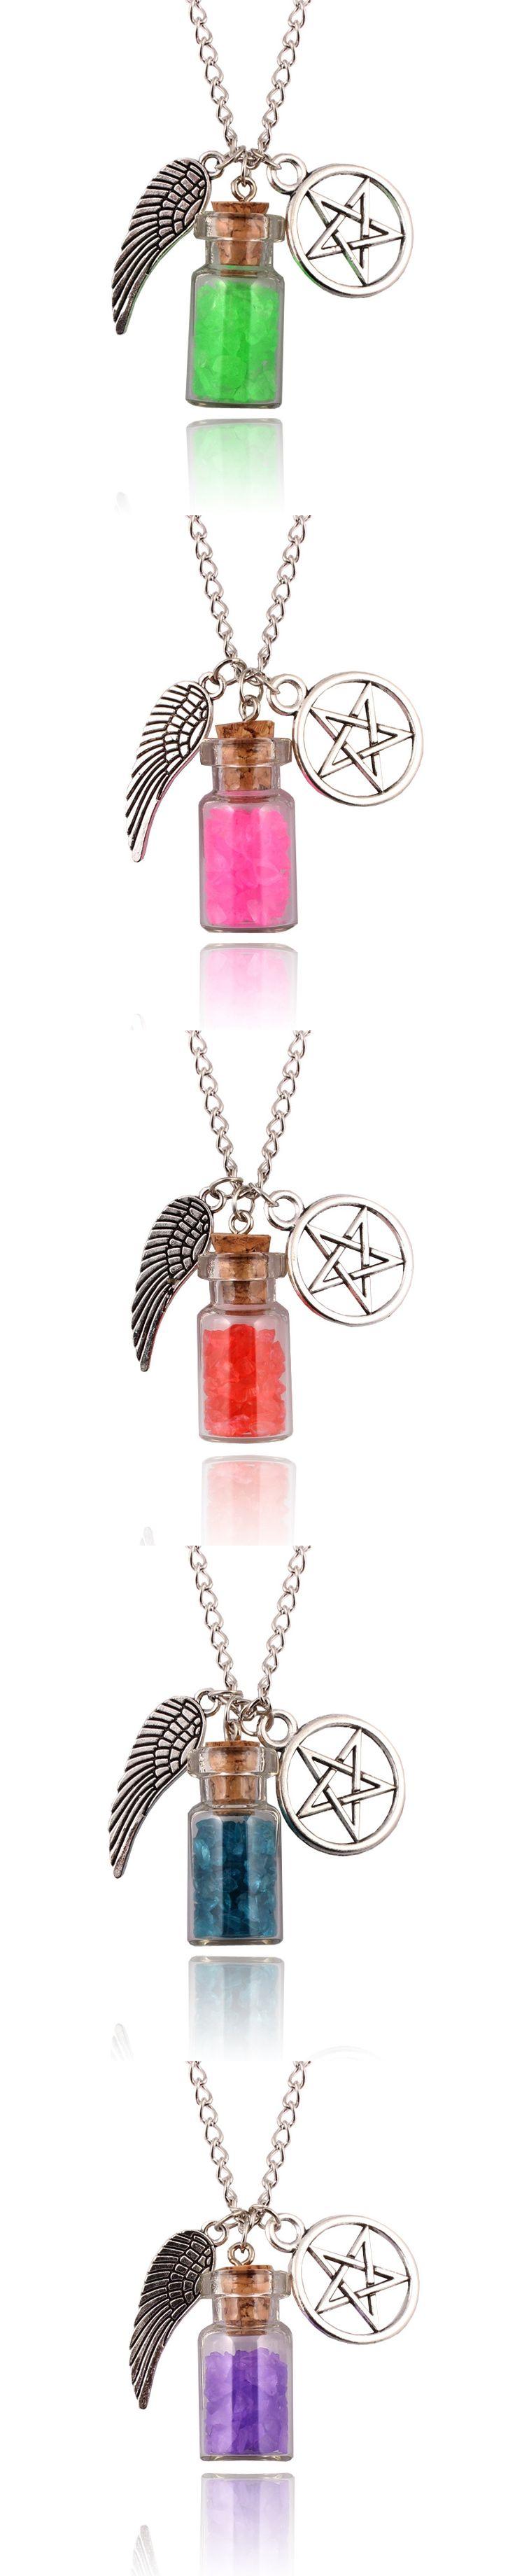 New Super Natural Power Glass Wishing Salt Bottle Angel Wings Five Wings Star Retro European American Amulet Pendant Necklace